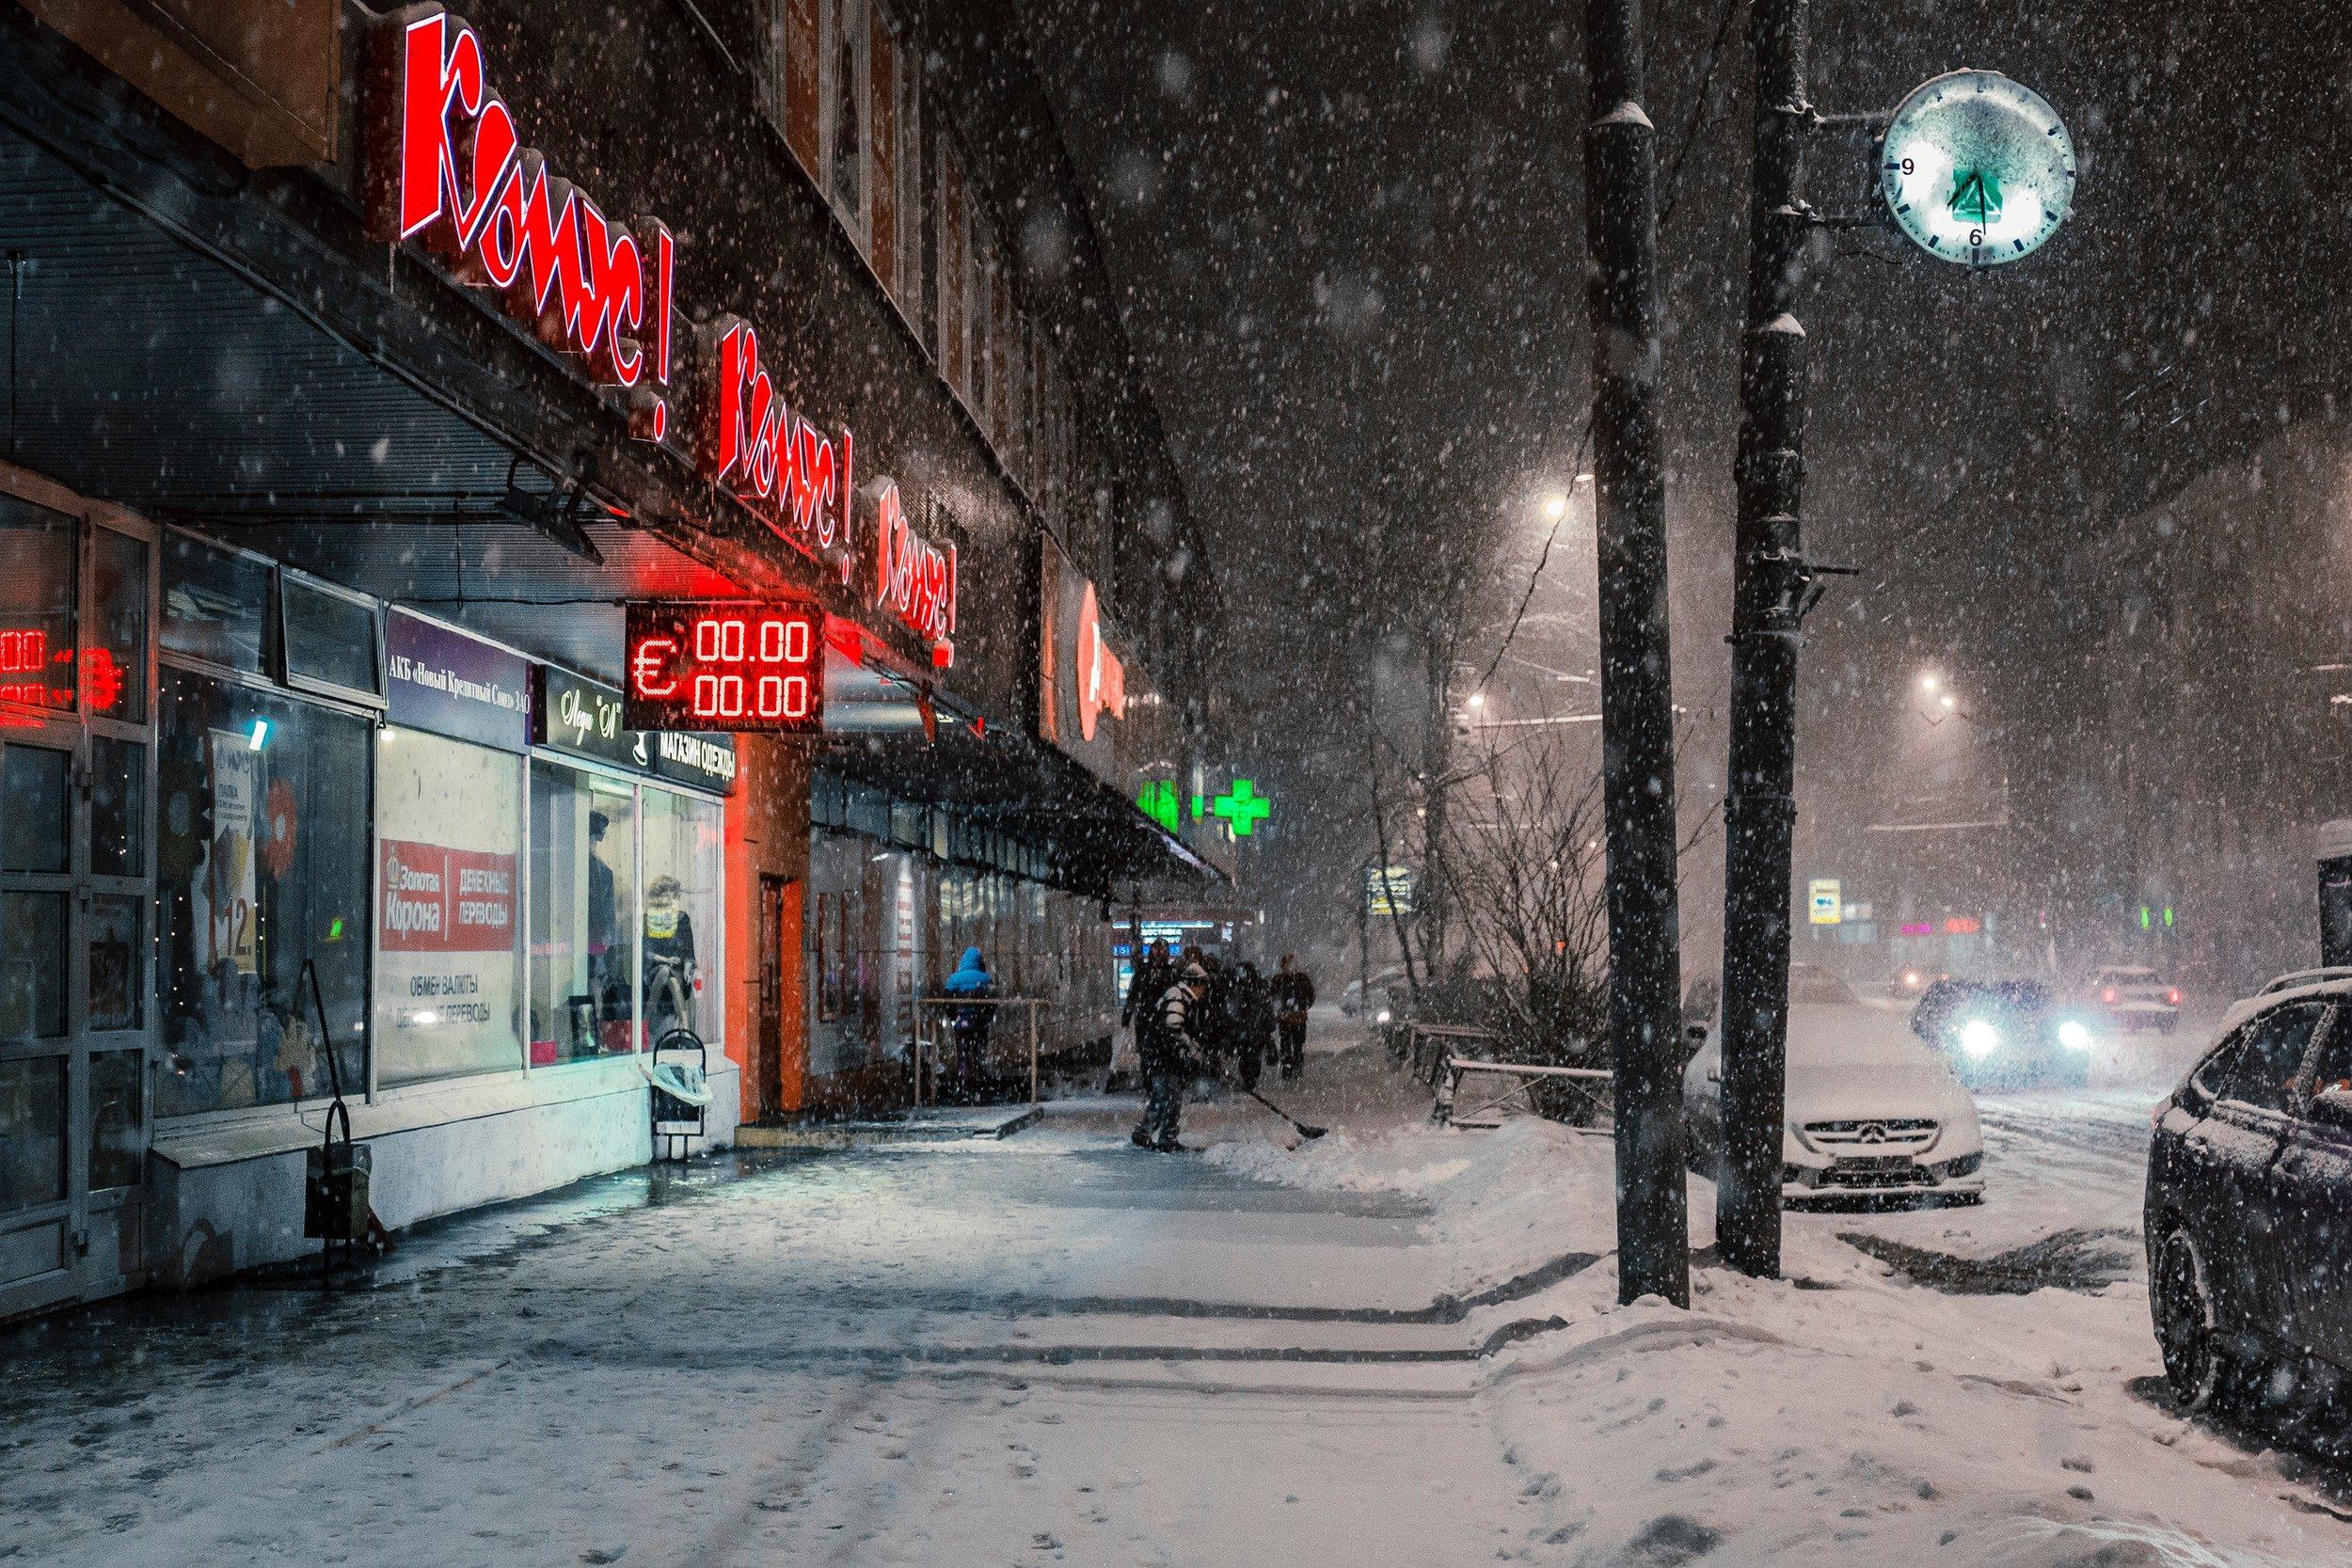 alexander-popov-367071-unsplash.jpg